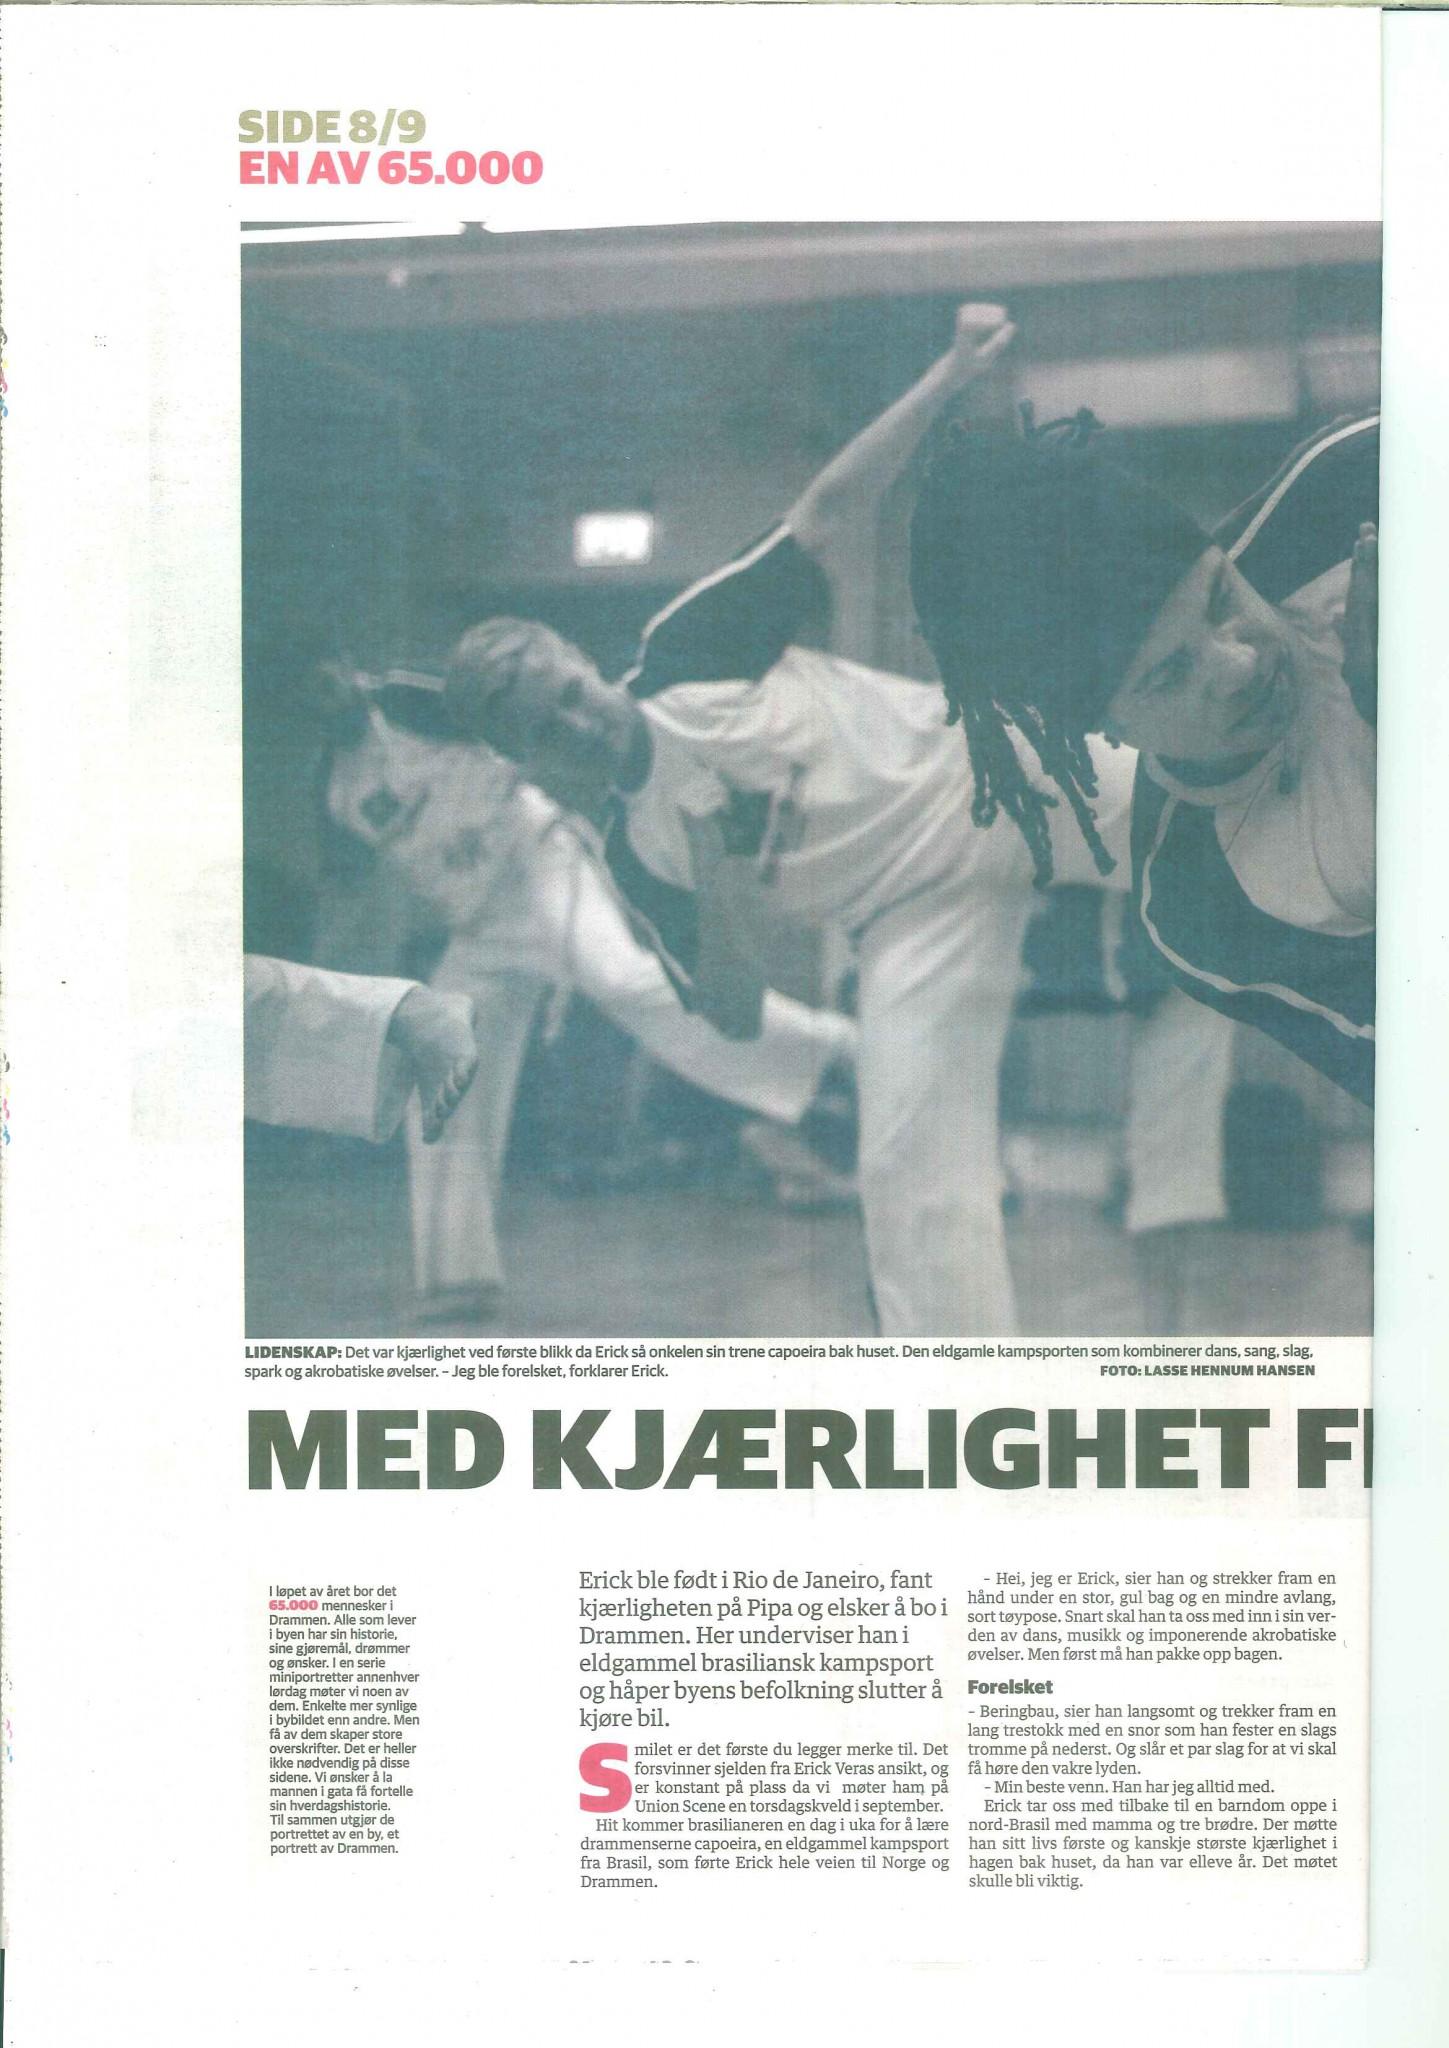 drammens-tidene-capoeira-erick-veras